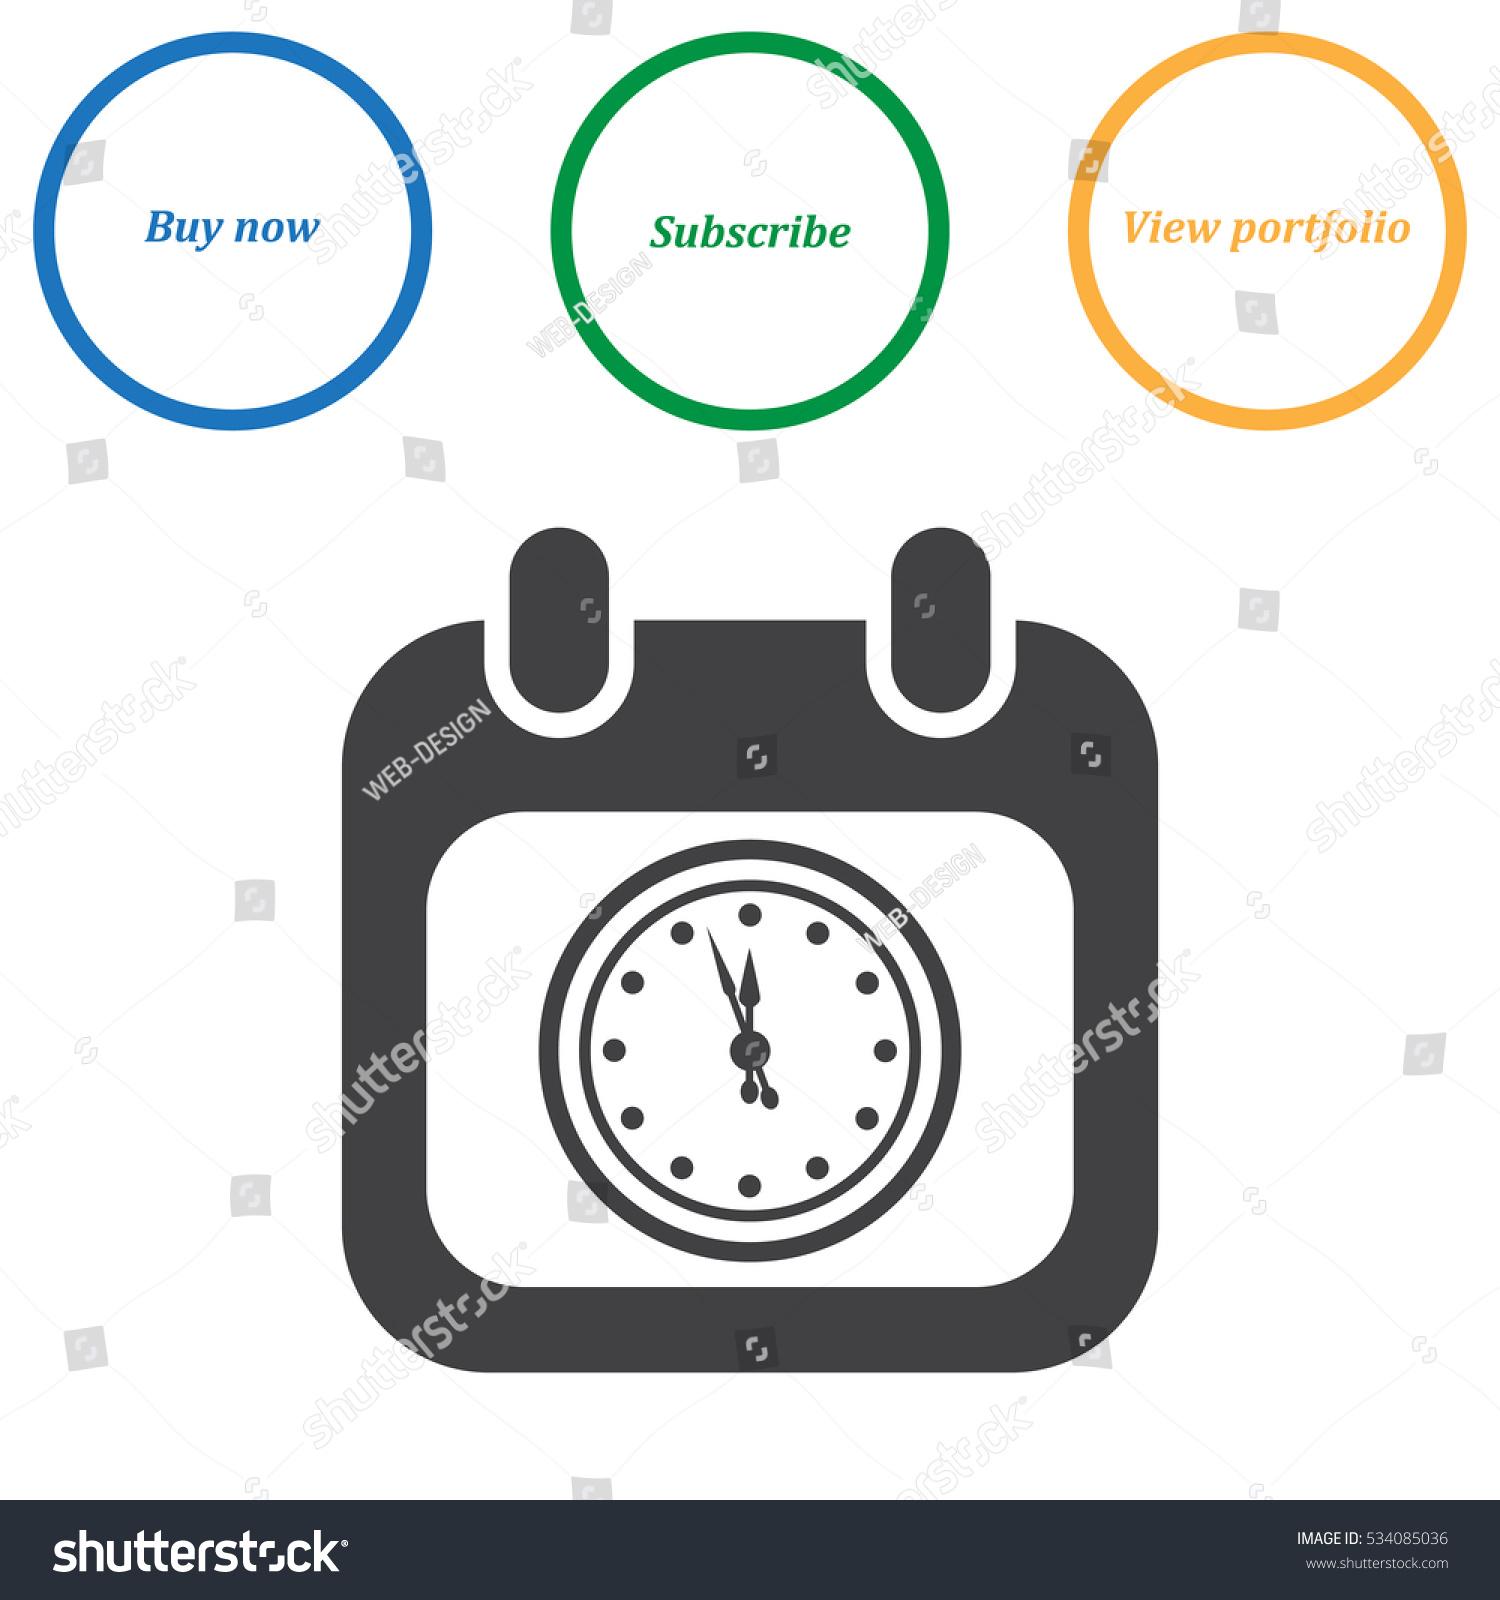 Calendar Flat Illustration : Calendar icon vector flat design style stock